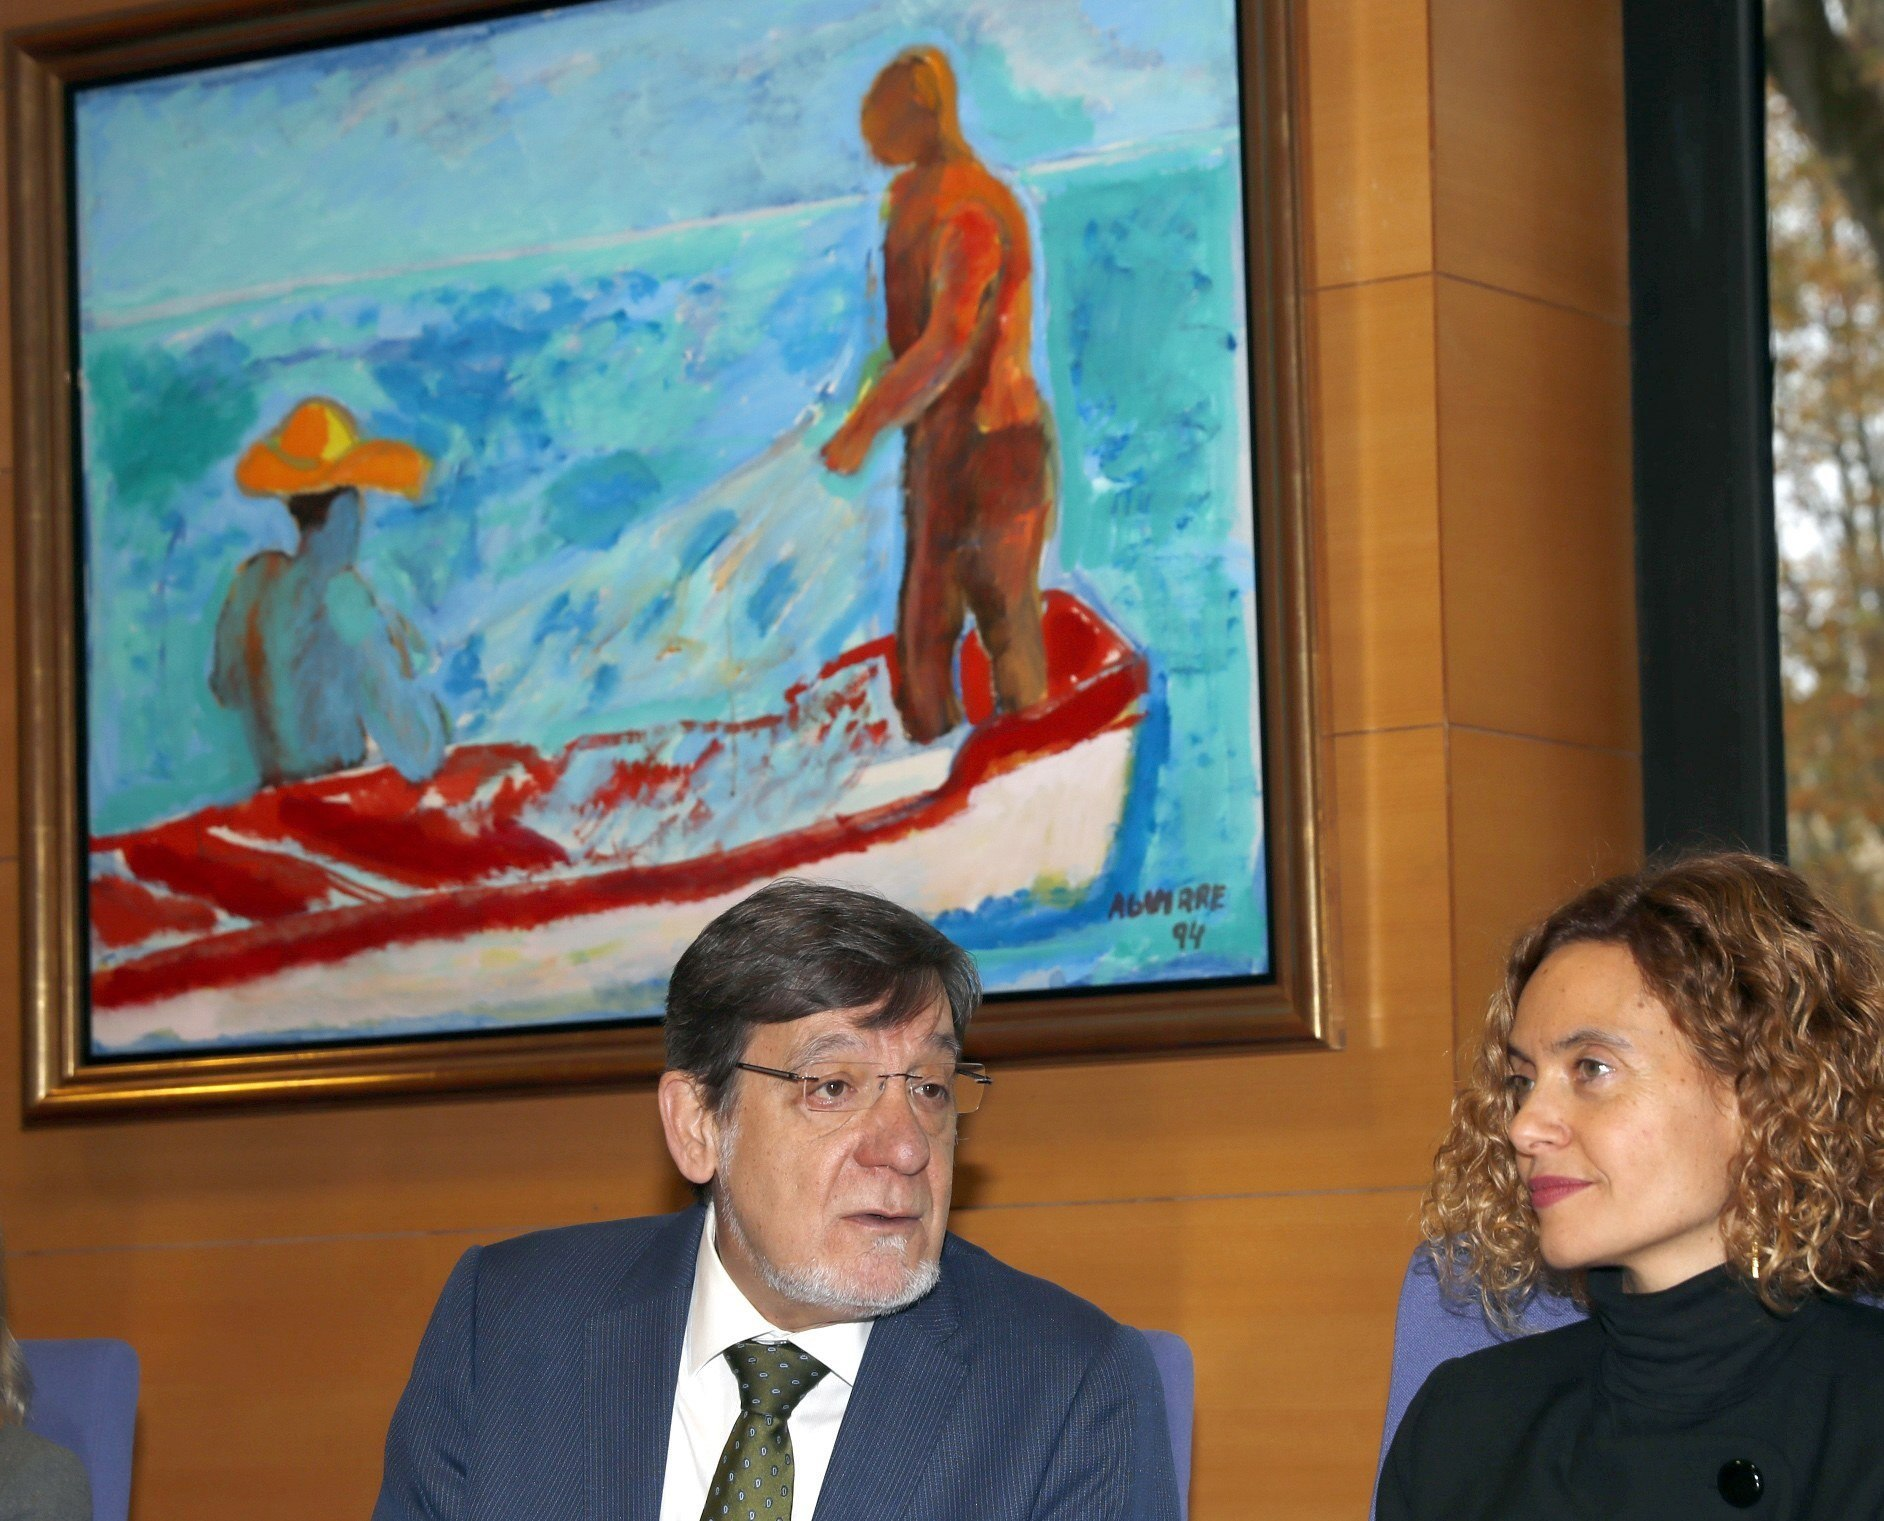 La ministra Meritxell Batet junto al presidente del TSJPV Juan Luis Ibarra en Bilbao.